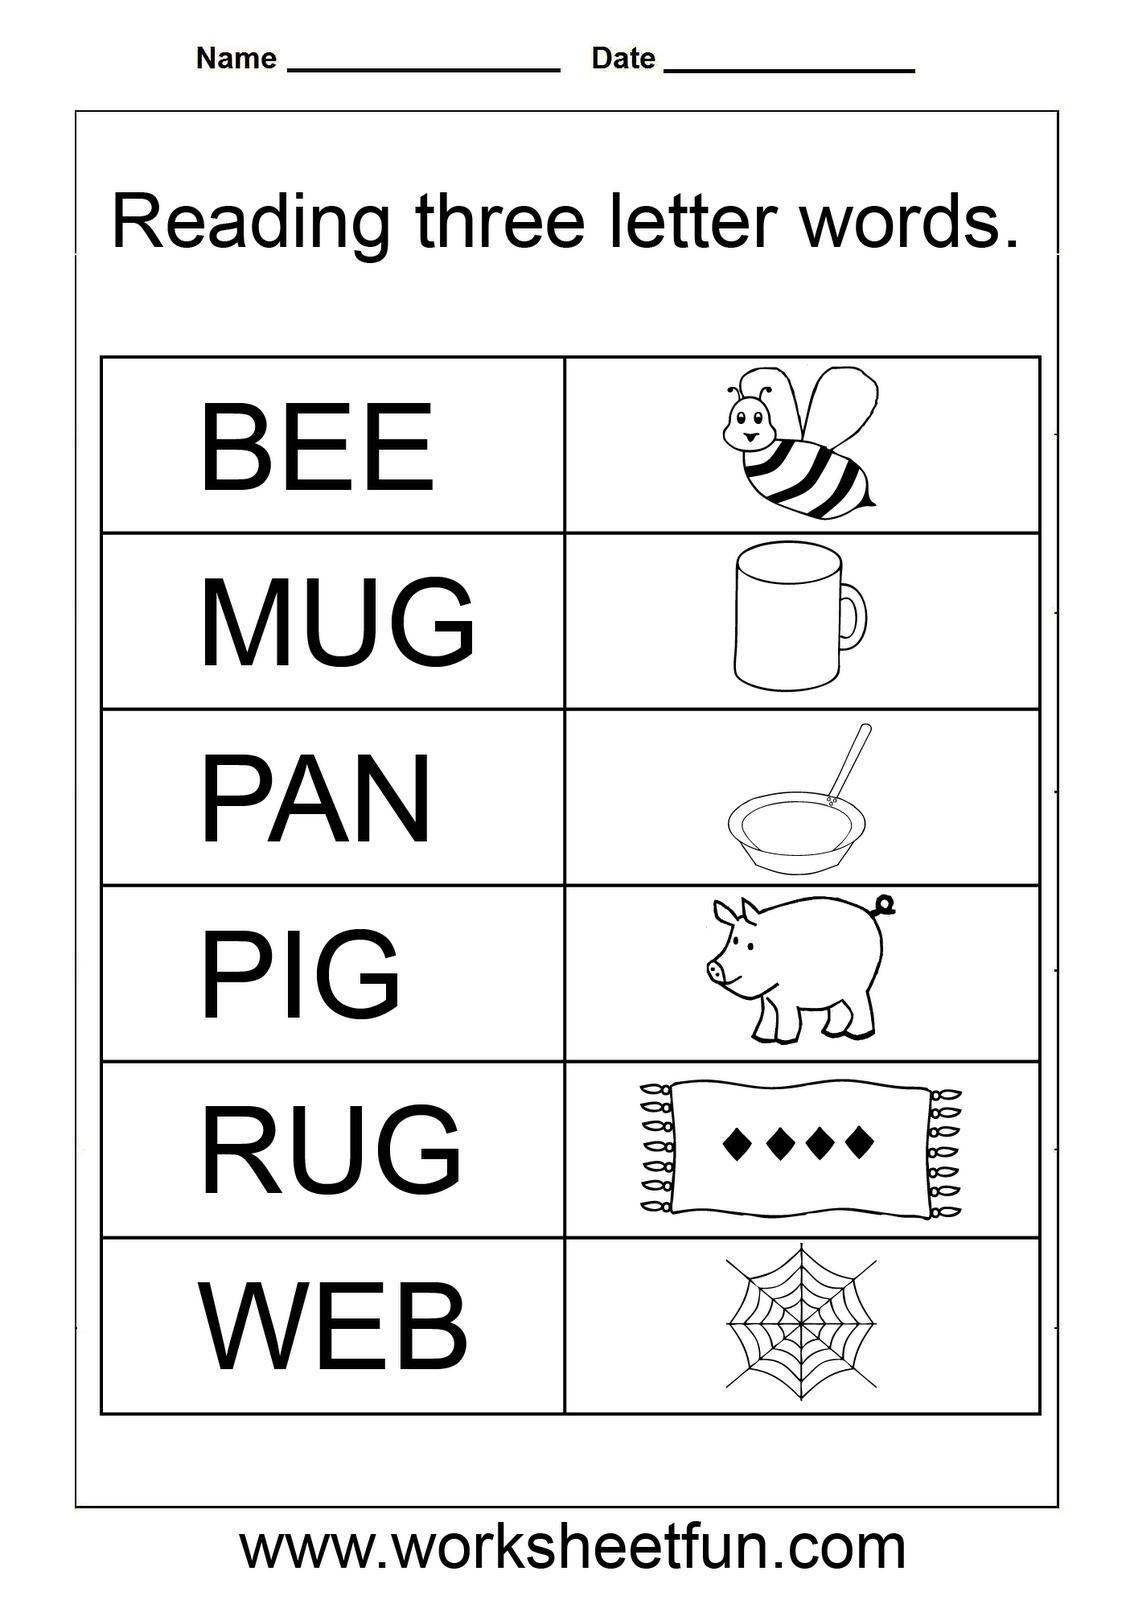 Simple Worksheets For Kindergarten – With Math Fractions Also Free | Homeschool Printable Worksheets Kindergarten